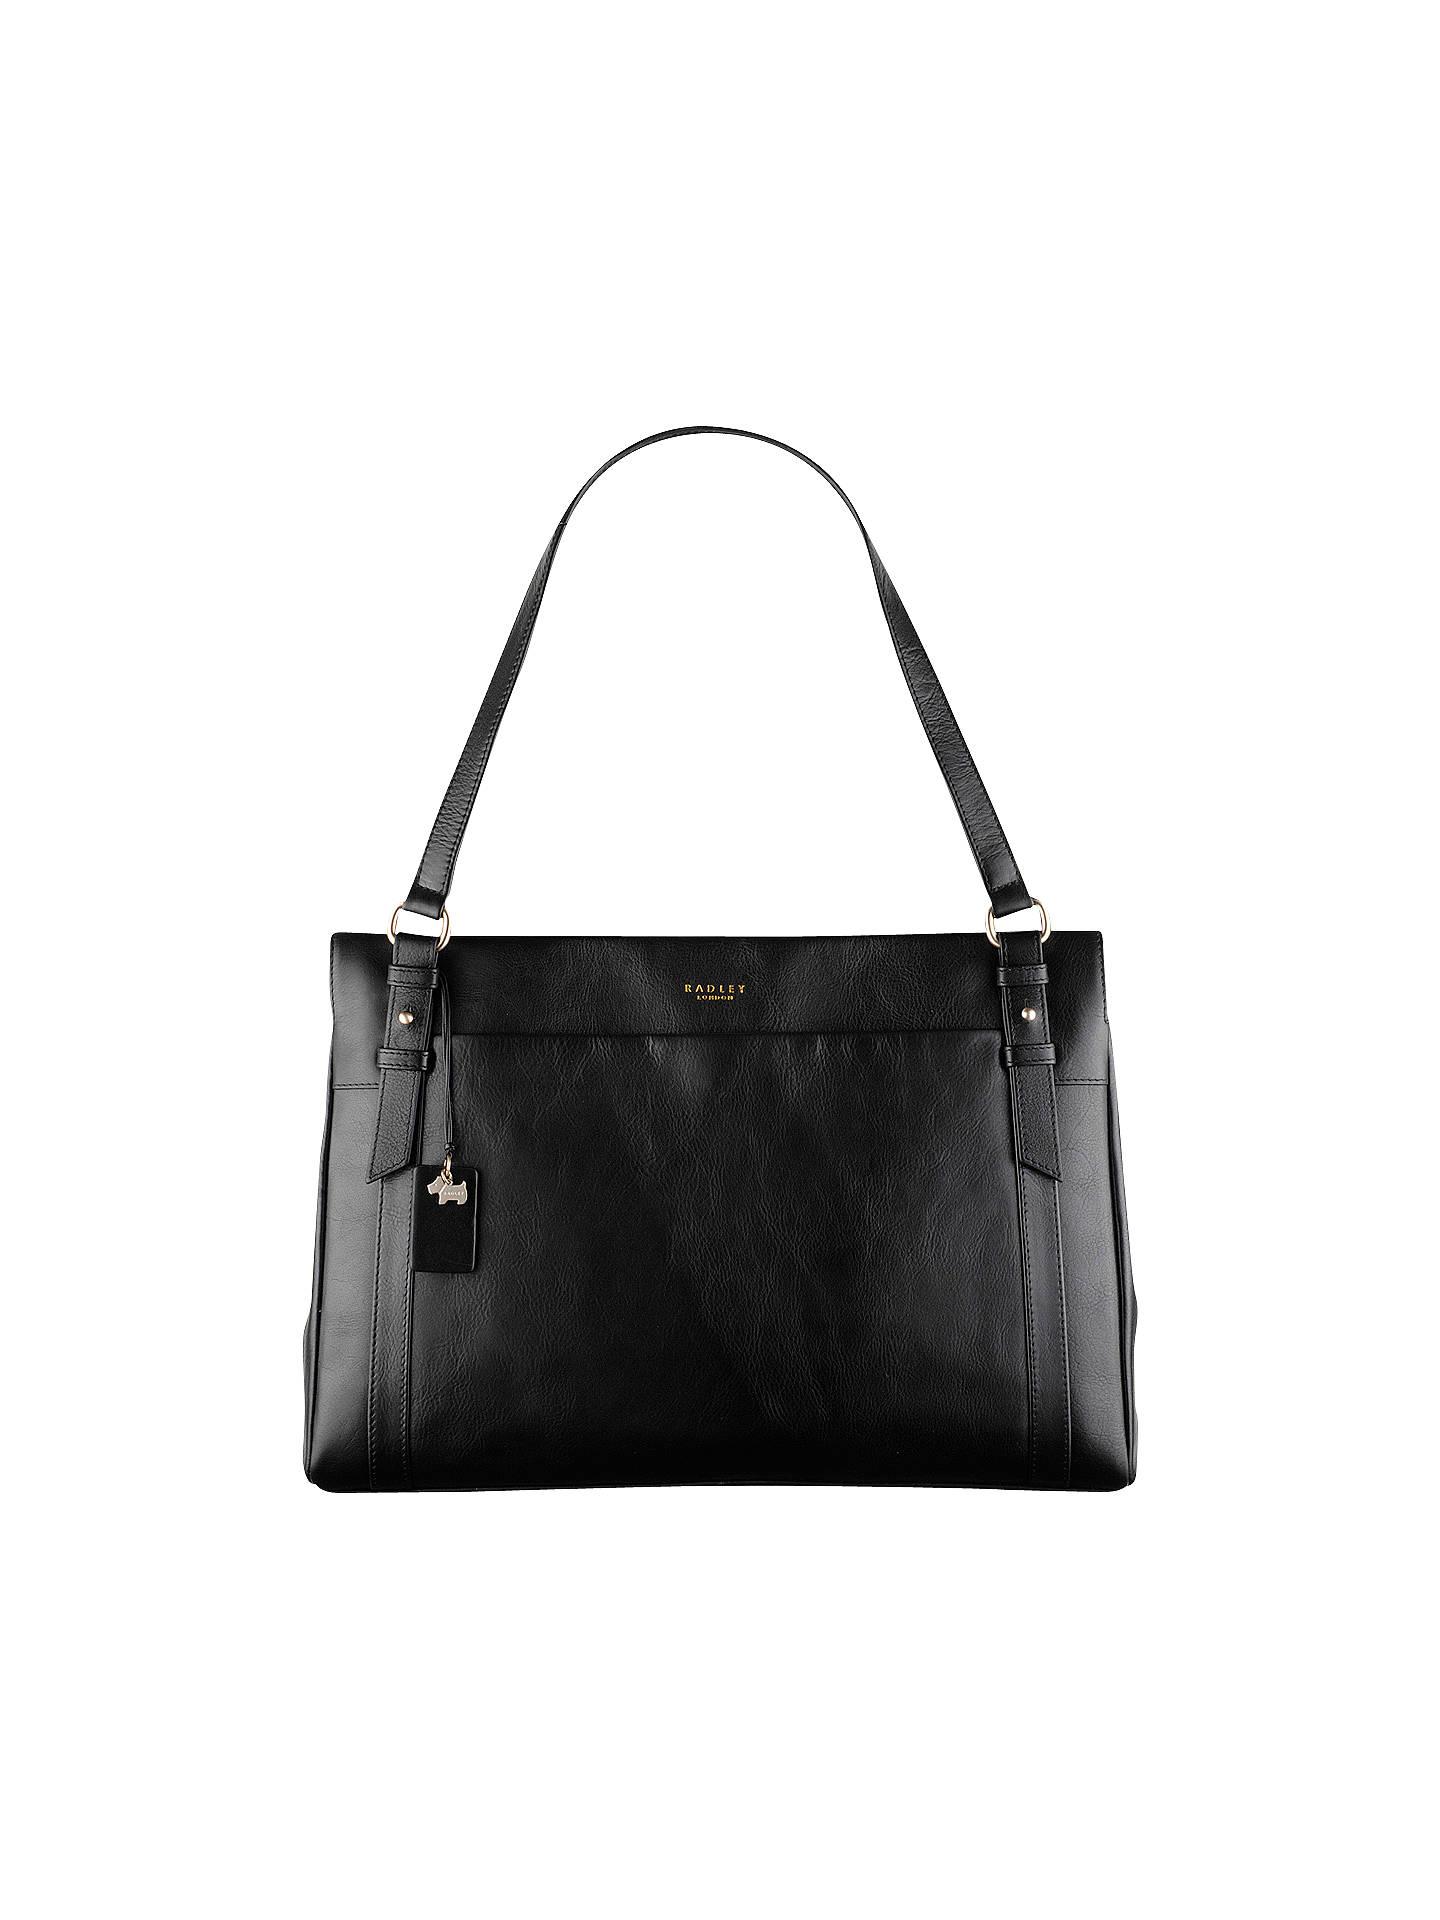 56e8e12fa Buy Radley Chelsea Large Leather Work Bag, Black Online at johnlewis.com ...